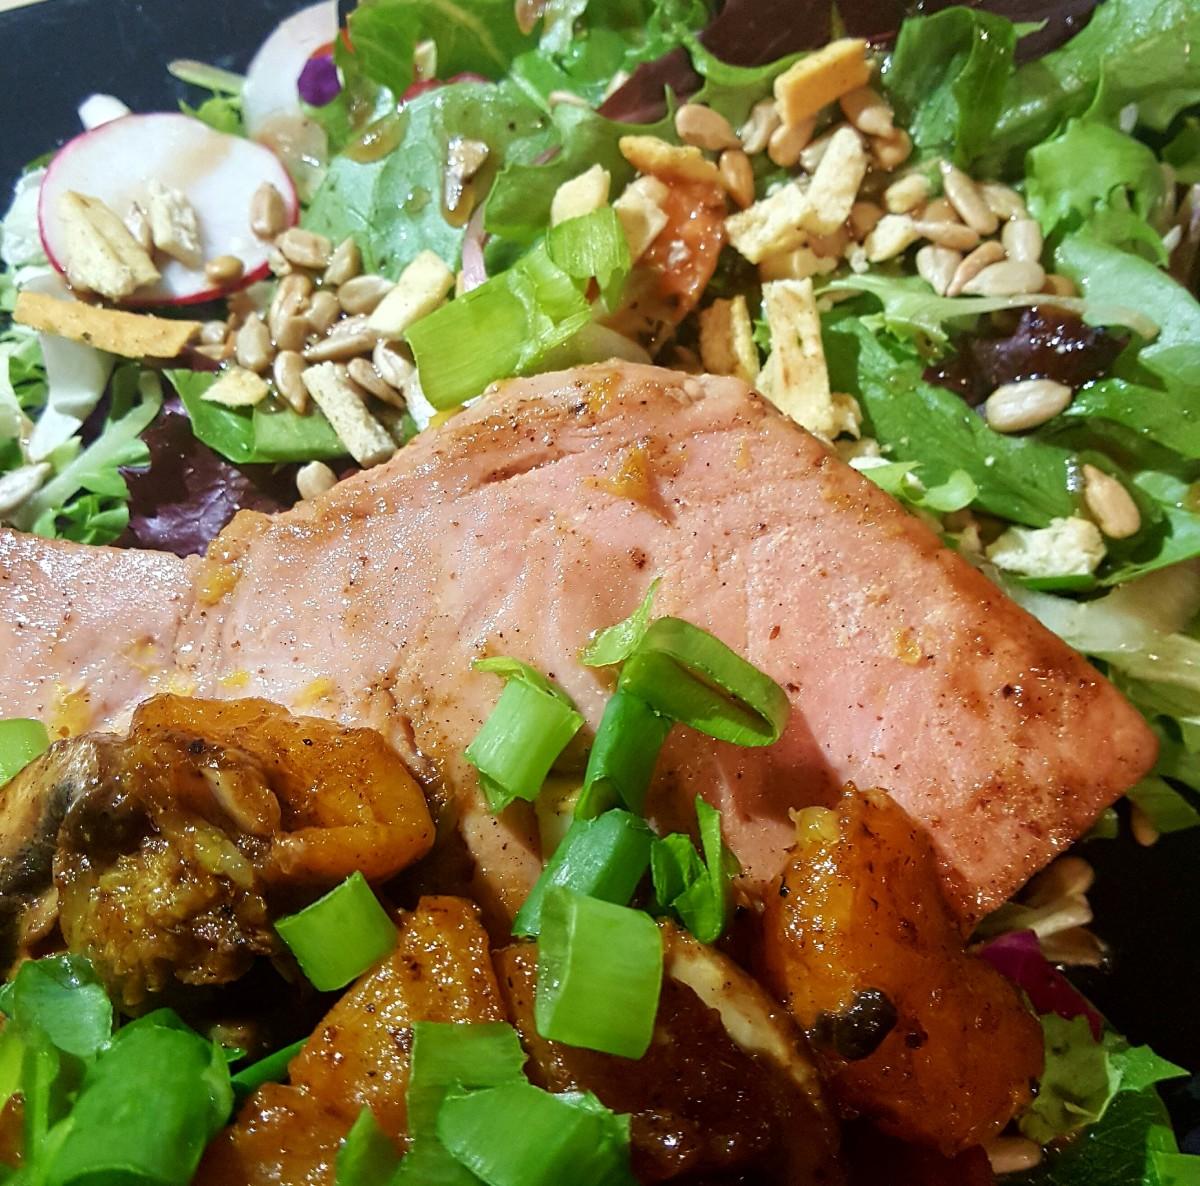 Orange-Seared Yellowfin Tuna With Sesame Glaze & Greens